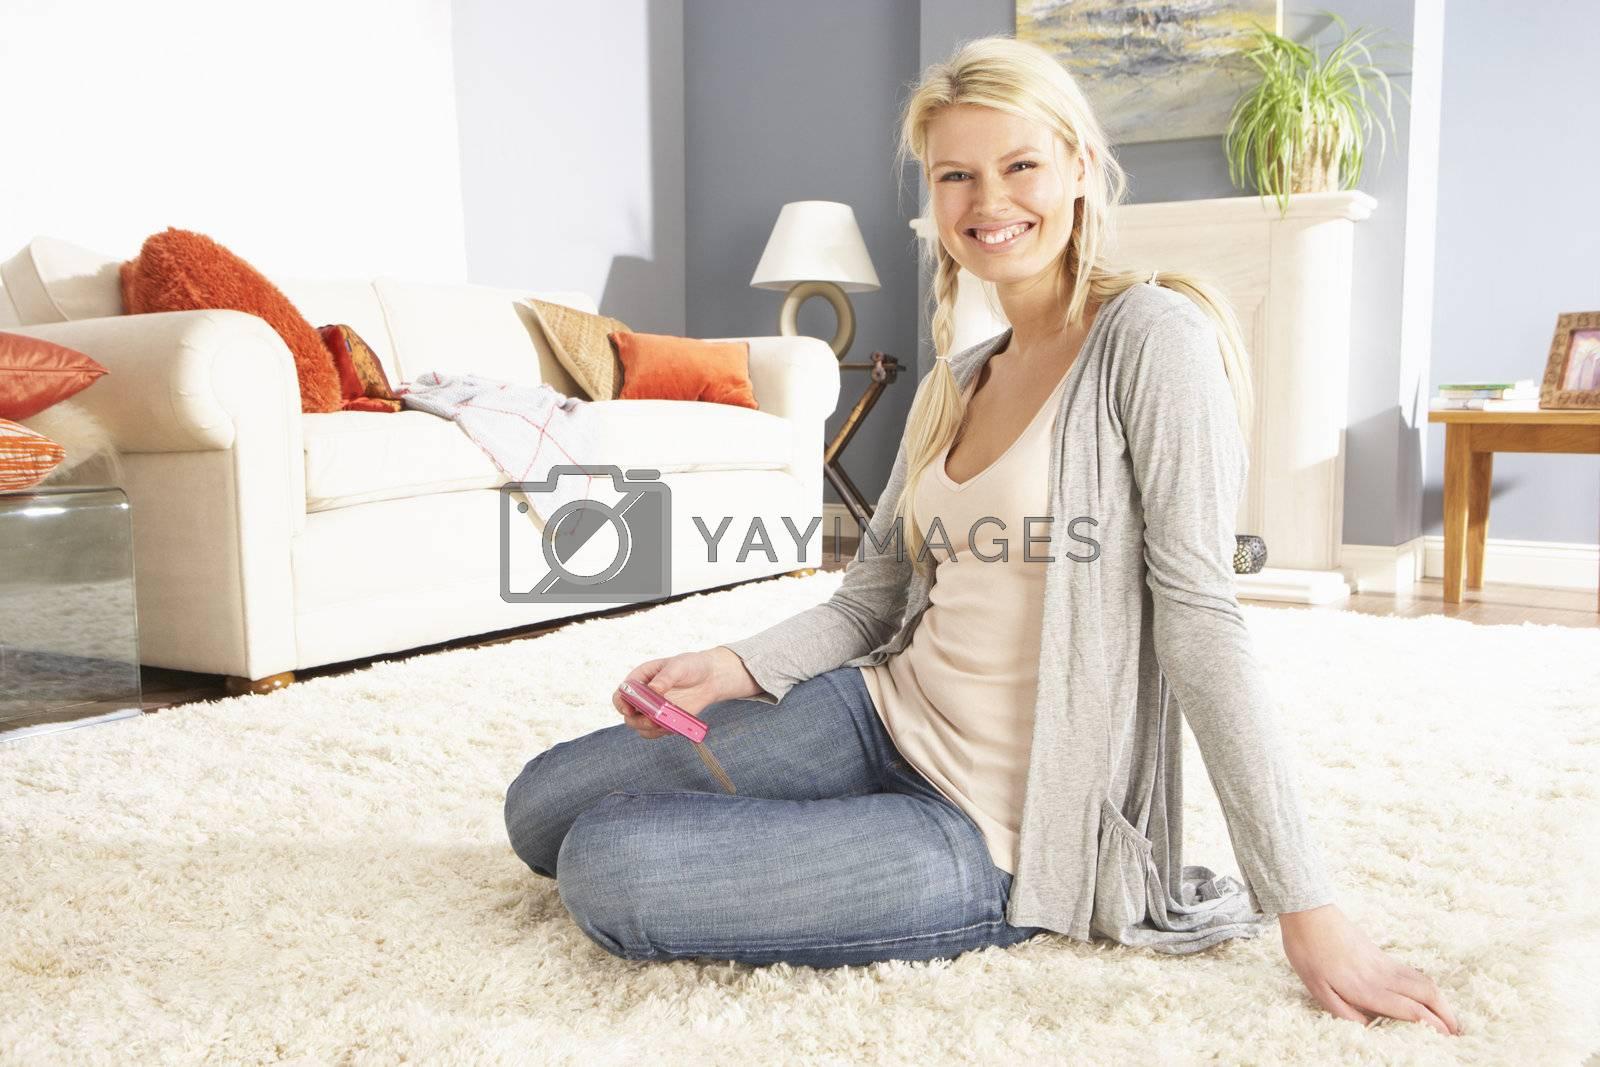 Young Woman Looking At Photograph On Digital Camera At Home